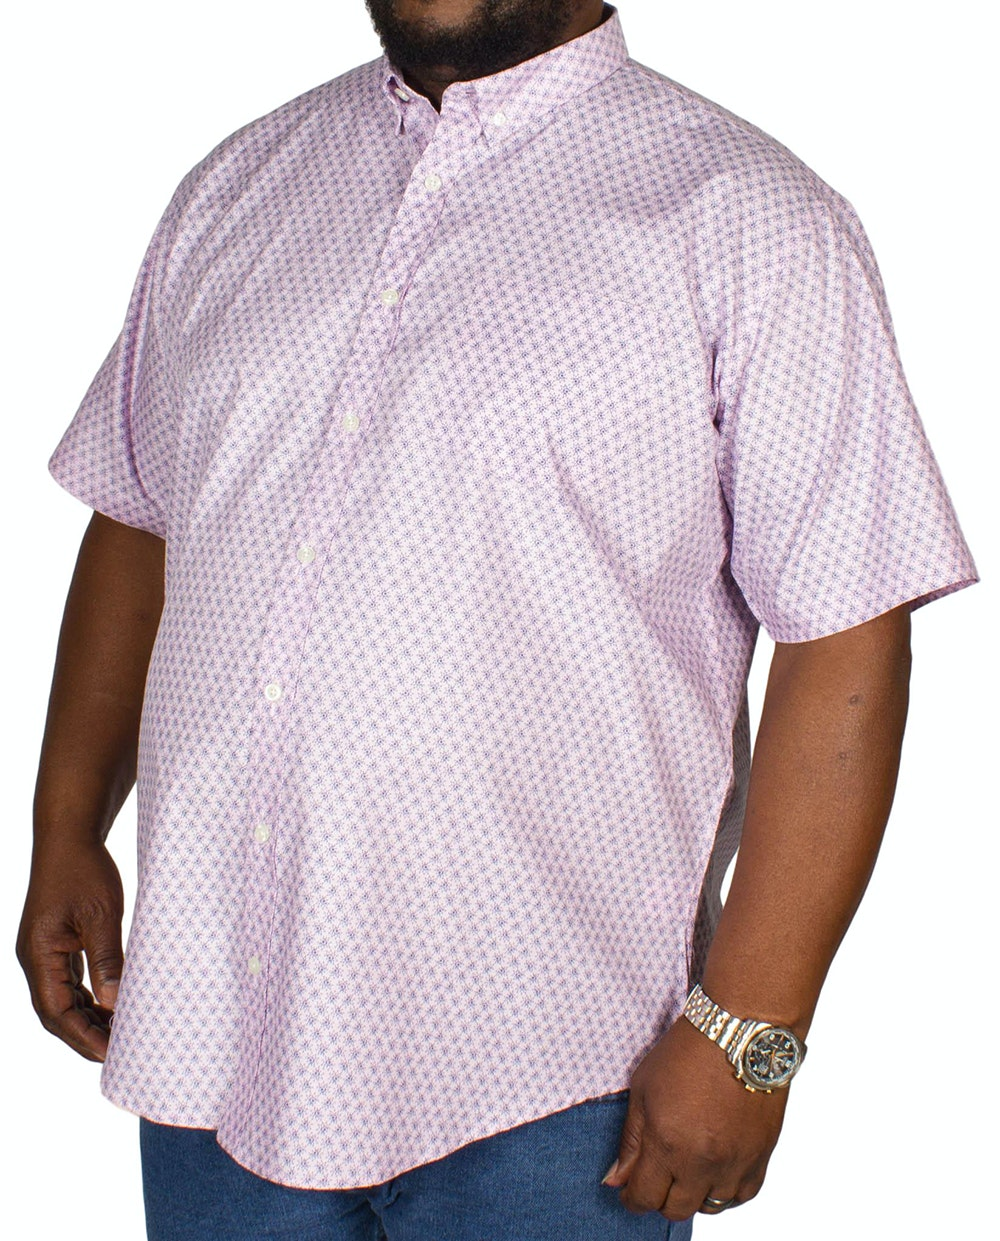 Bigdude All Over Print Shirt Pink